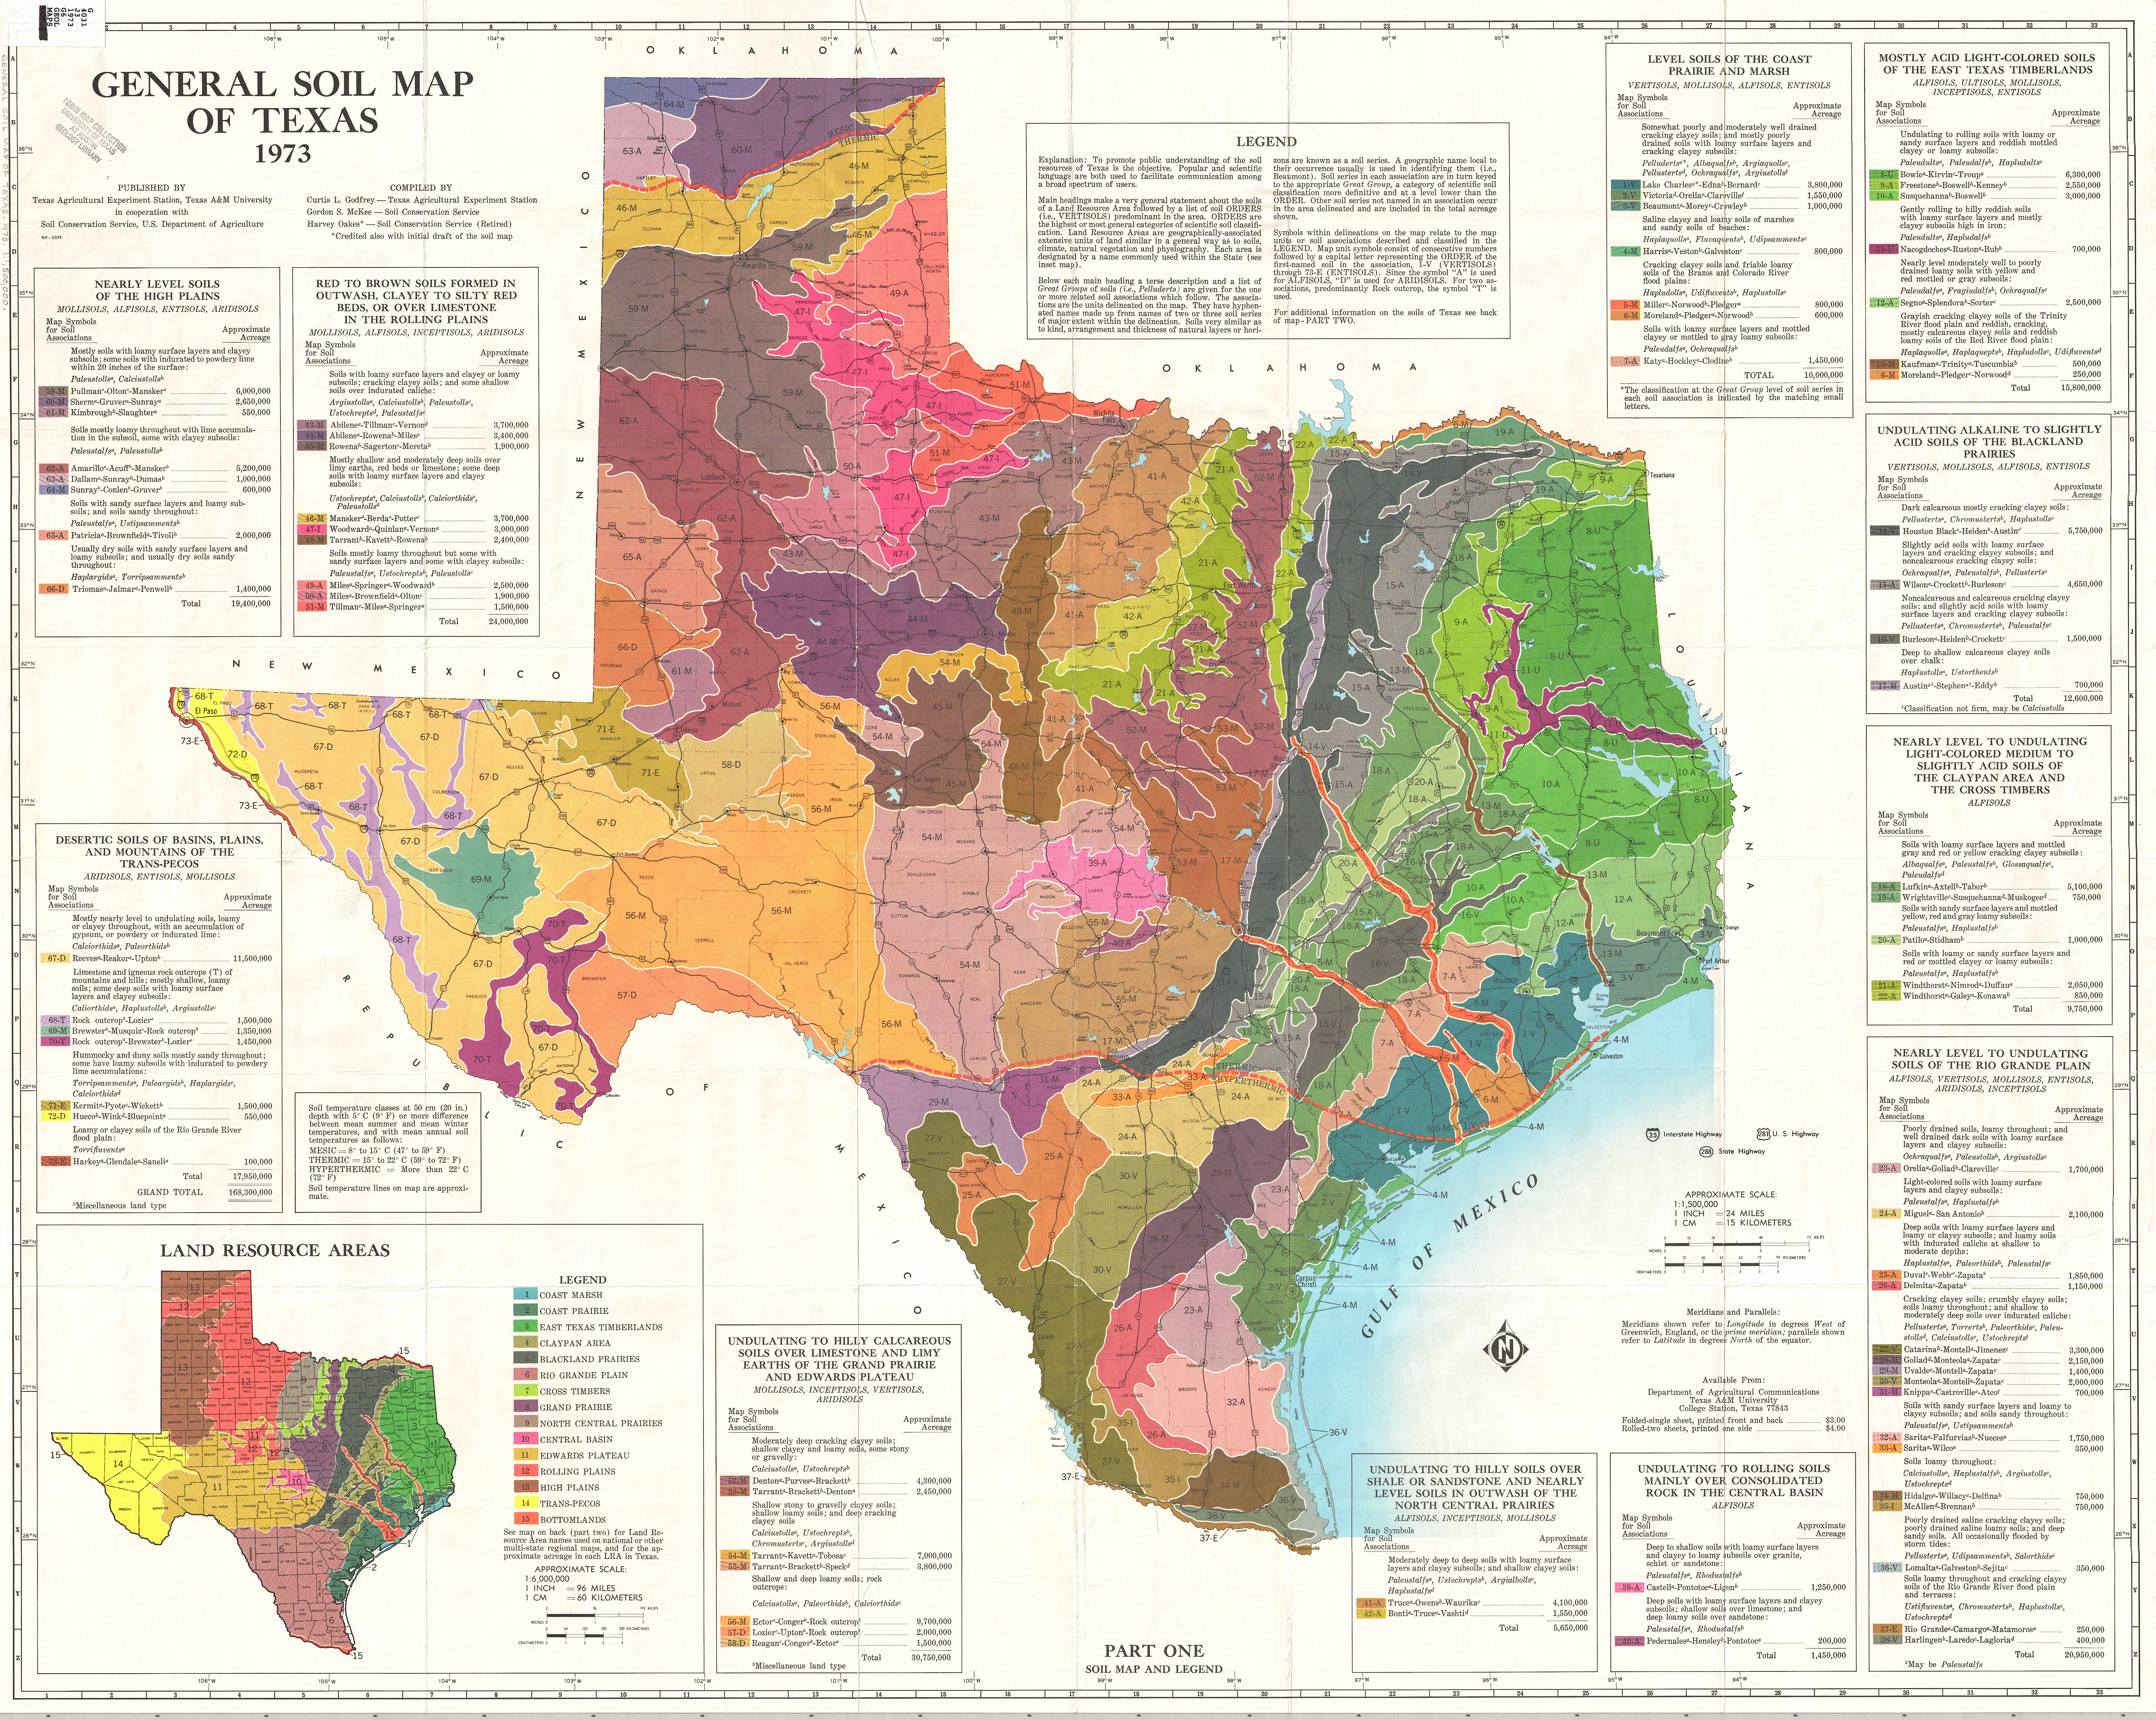 Map Of Texas Texas State Maps USA Maps Of Texas TX Texas Maps - Texas elevation map